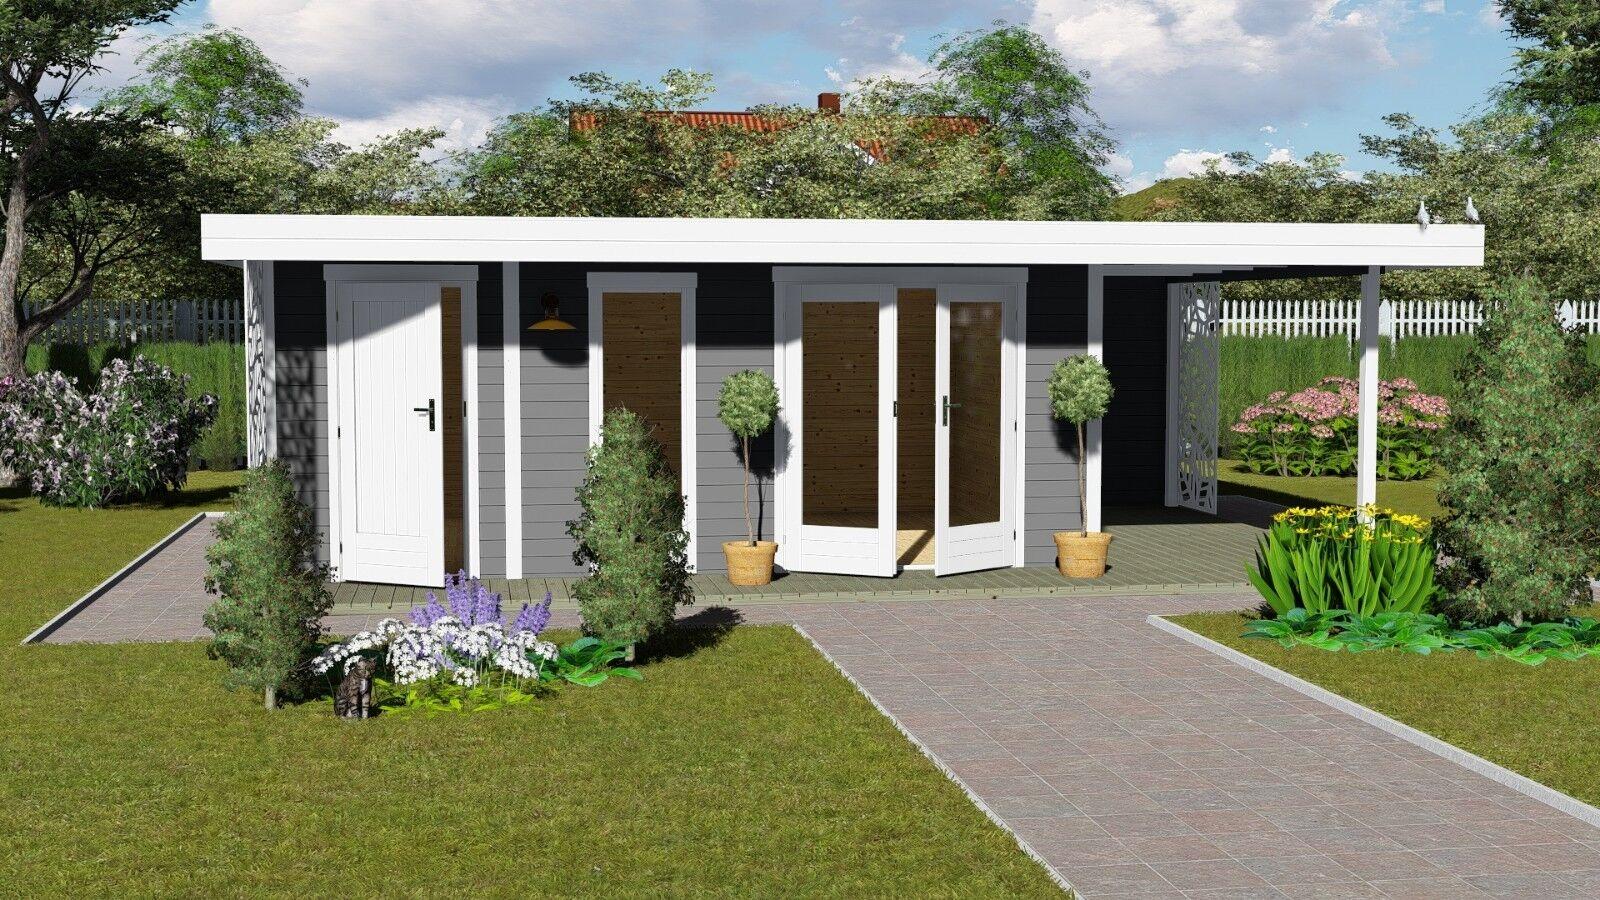 Gartenhaus Flachdach Anbau optional mit Terrasse 5.4x3.9m, 28mm Holz,Ulm 28233OF